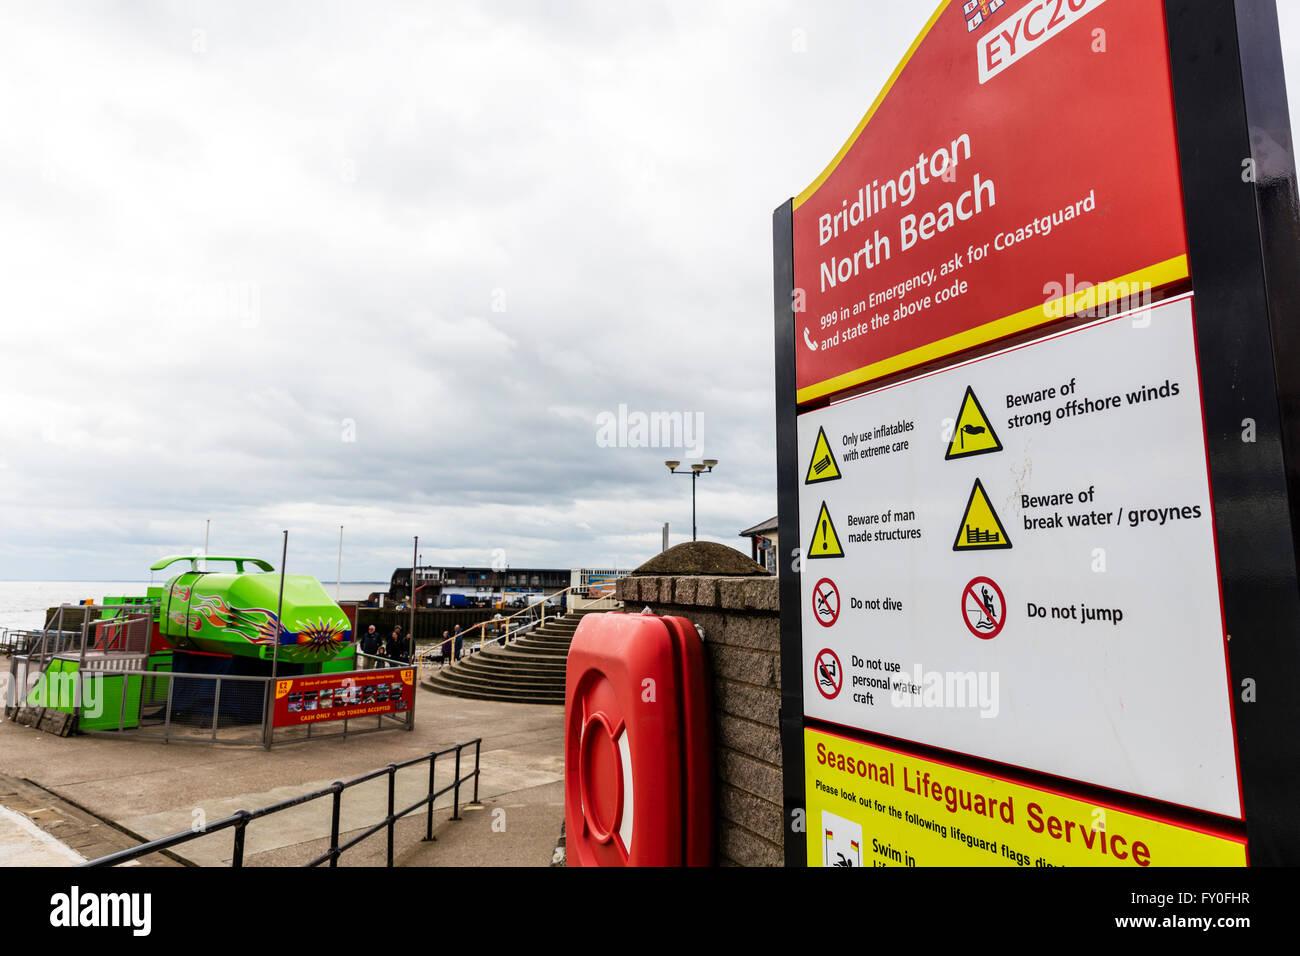 Bridlington north beach sign warnings life ring Yorkshire UK England coastal town towns - Stock Image